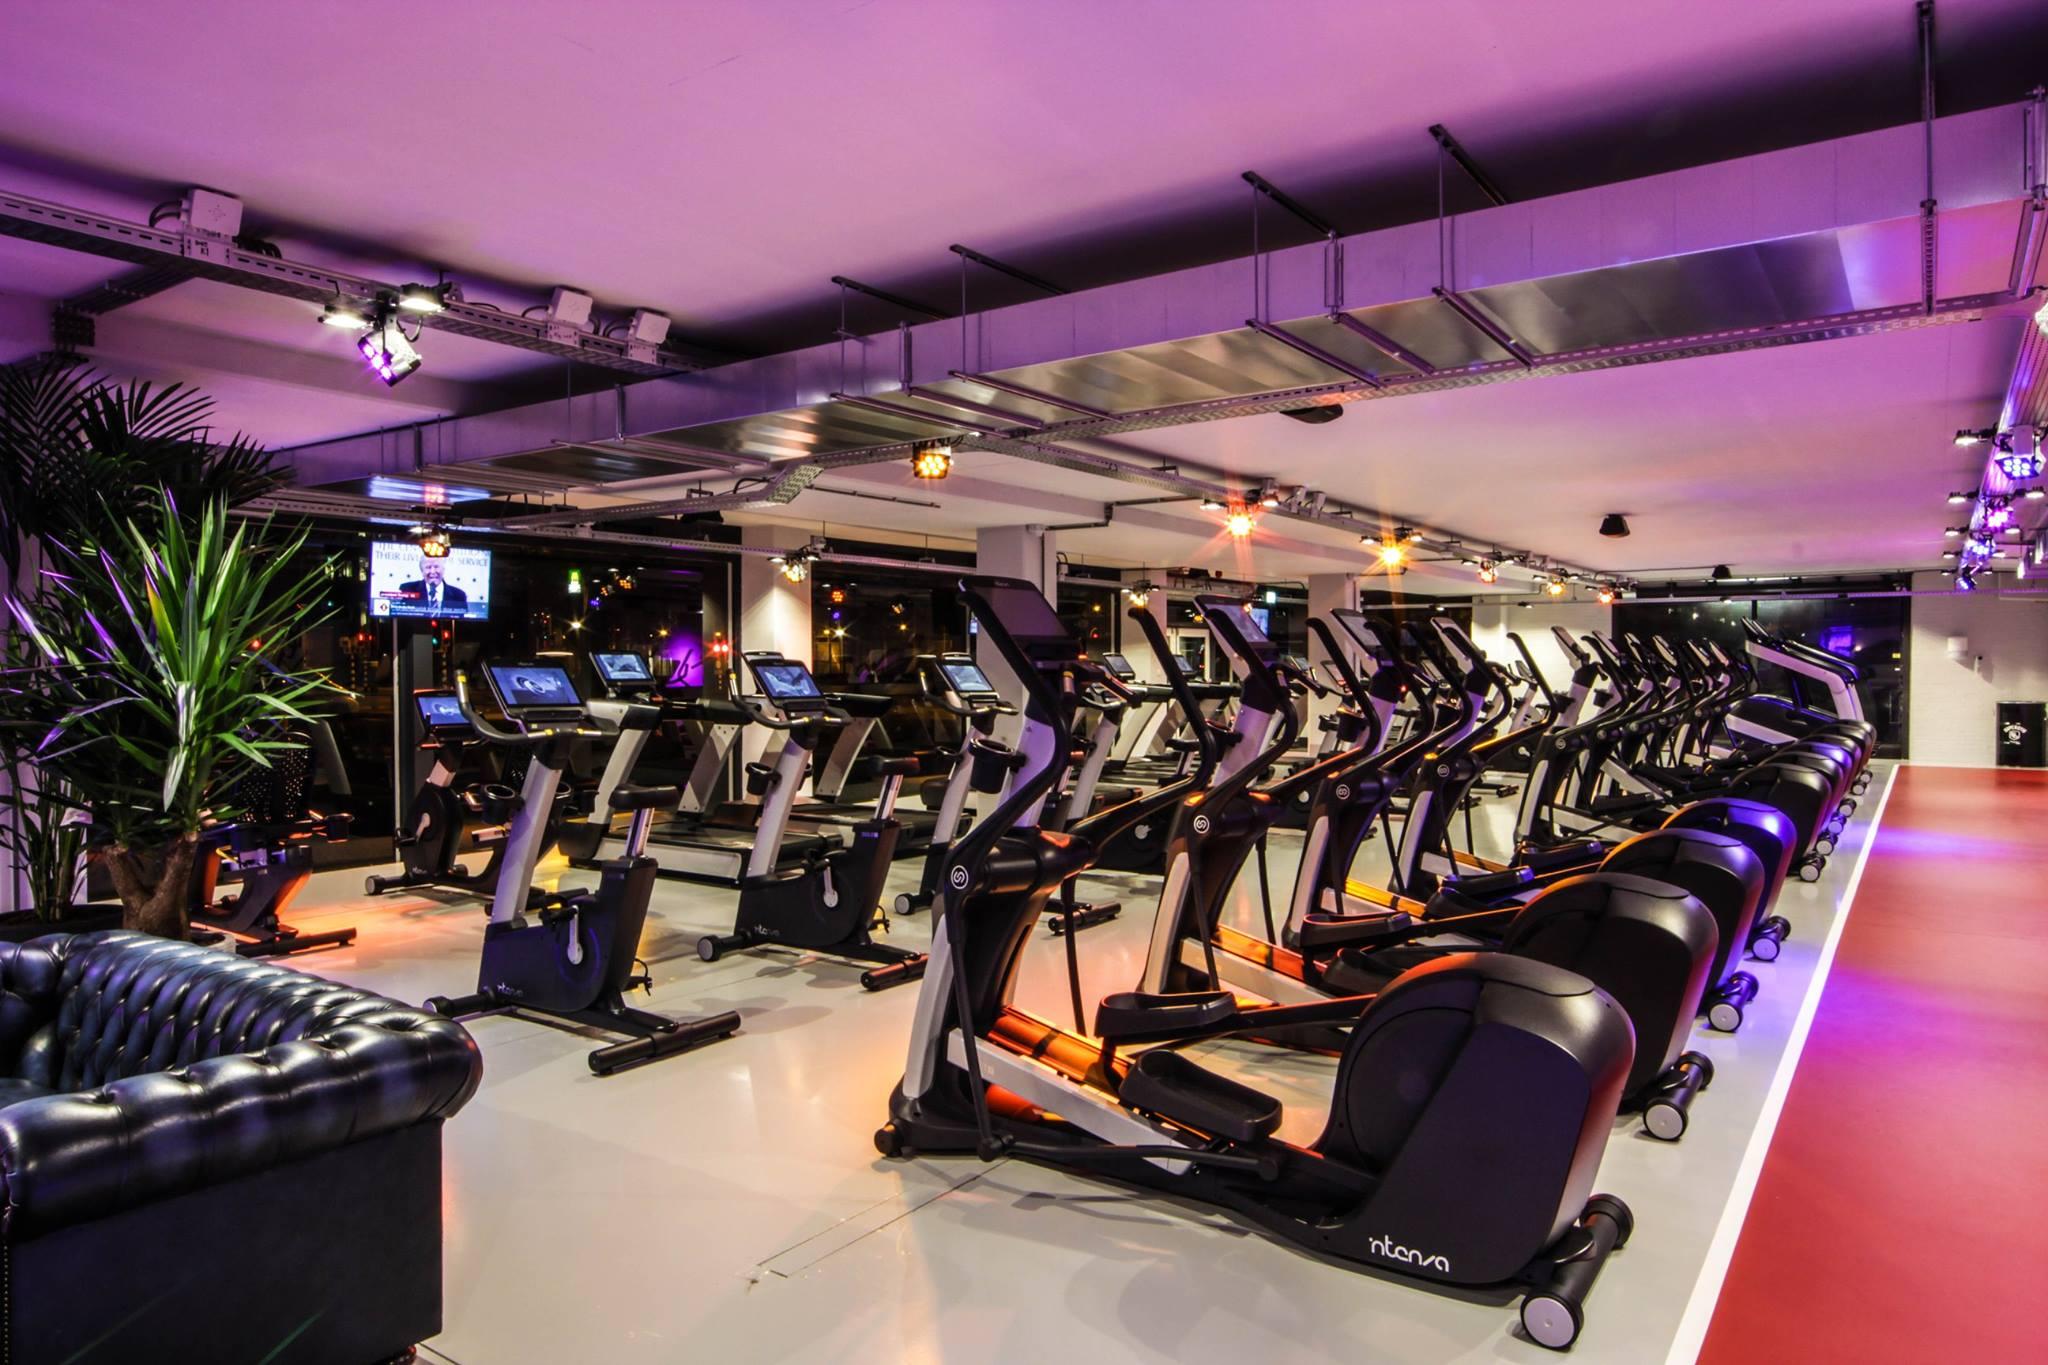 Fitnesscentra